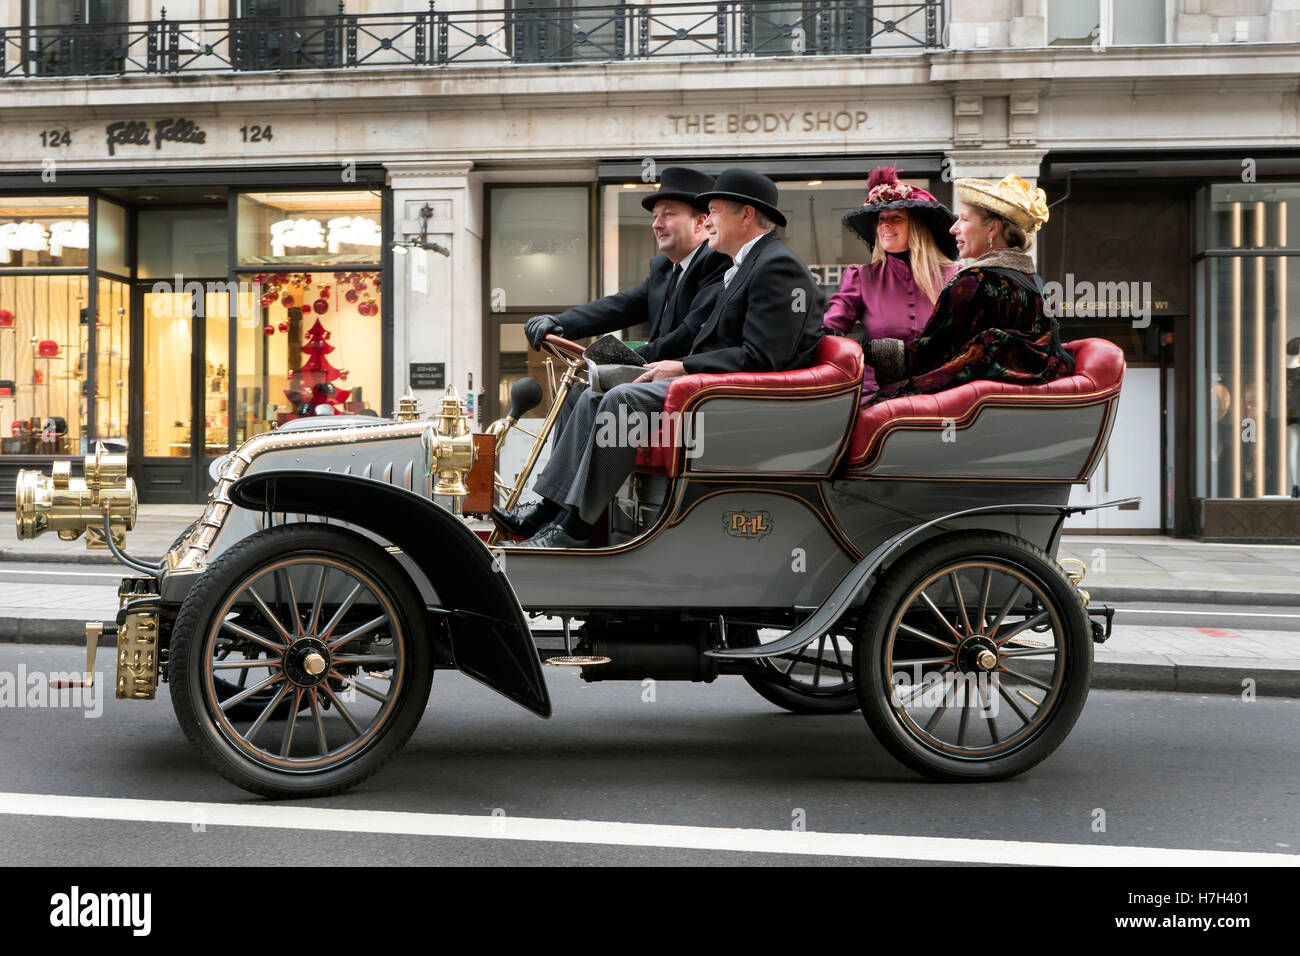 Veteran Cars Stock Photos & Veteran Cars Stock Images - Alamy